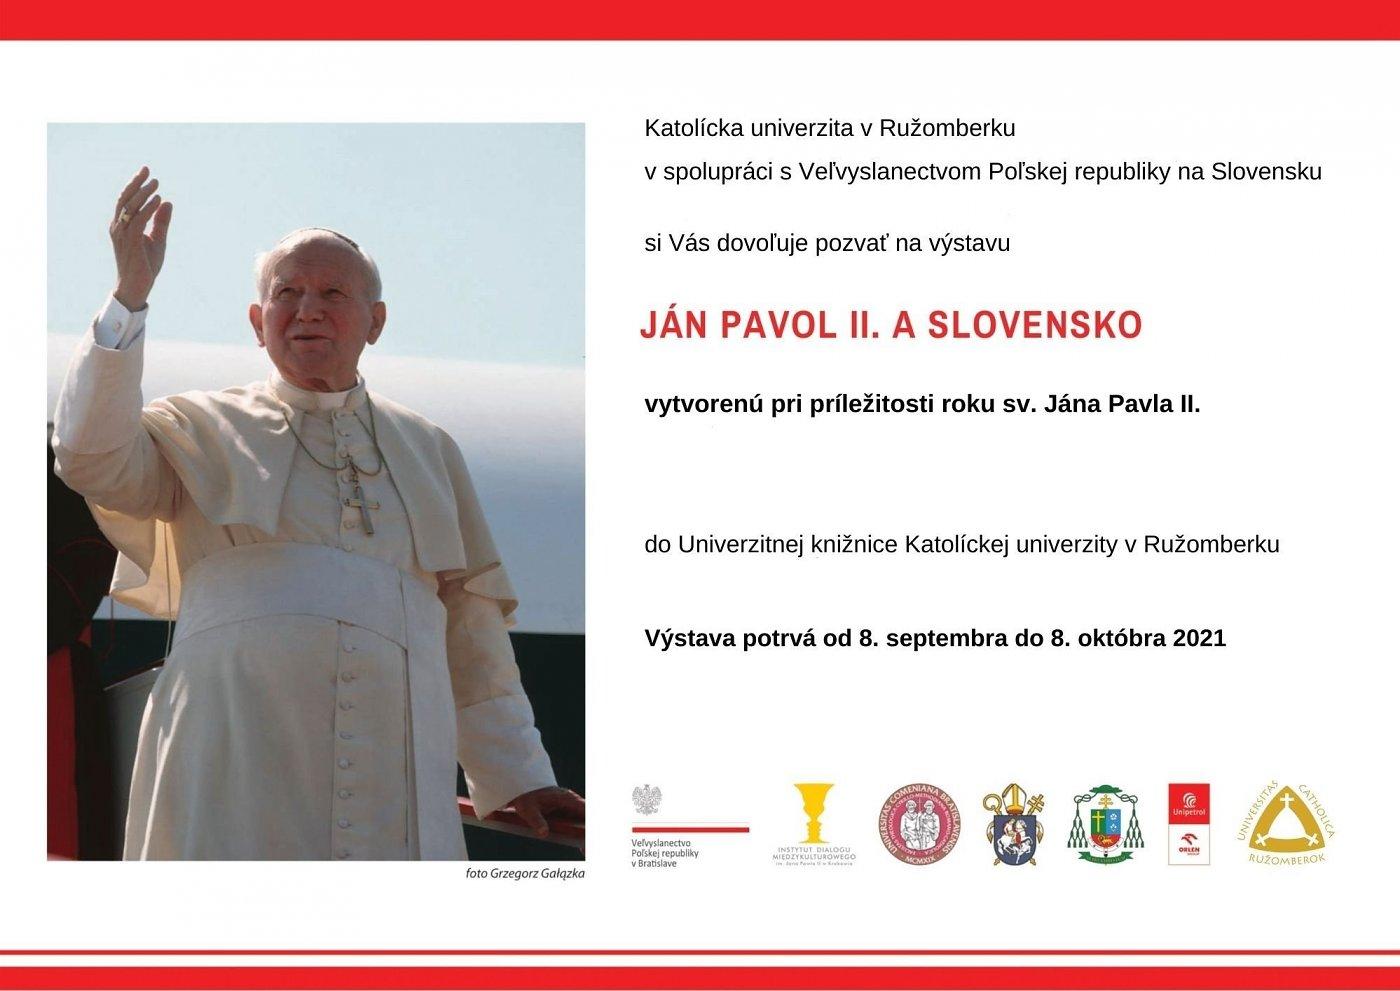 Ján Pavol II. a Slovensko